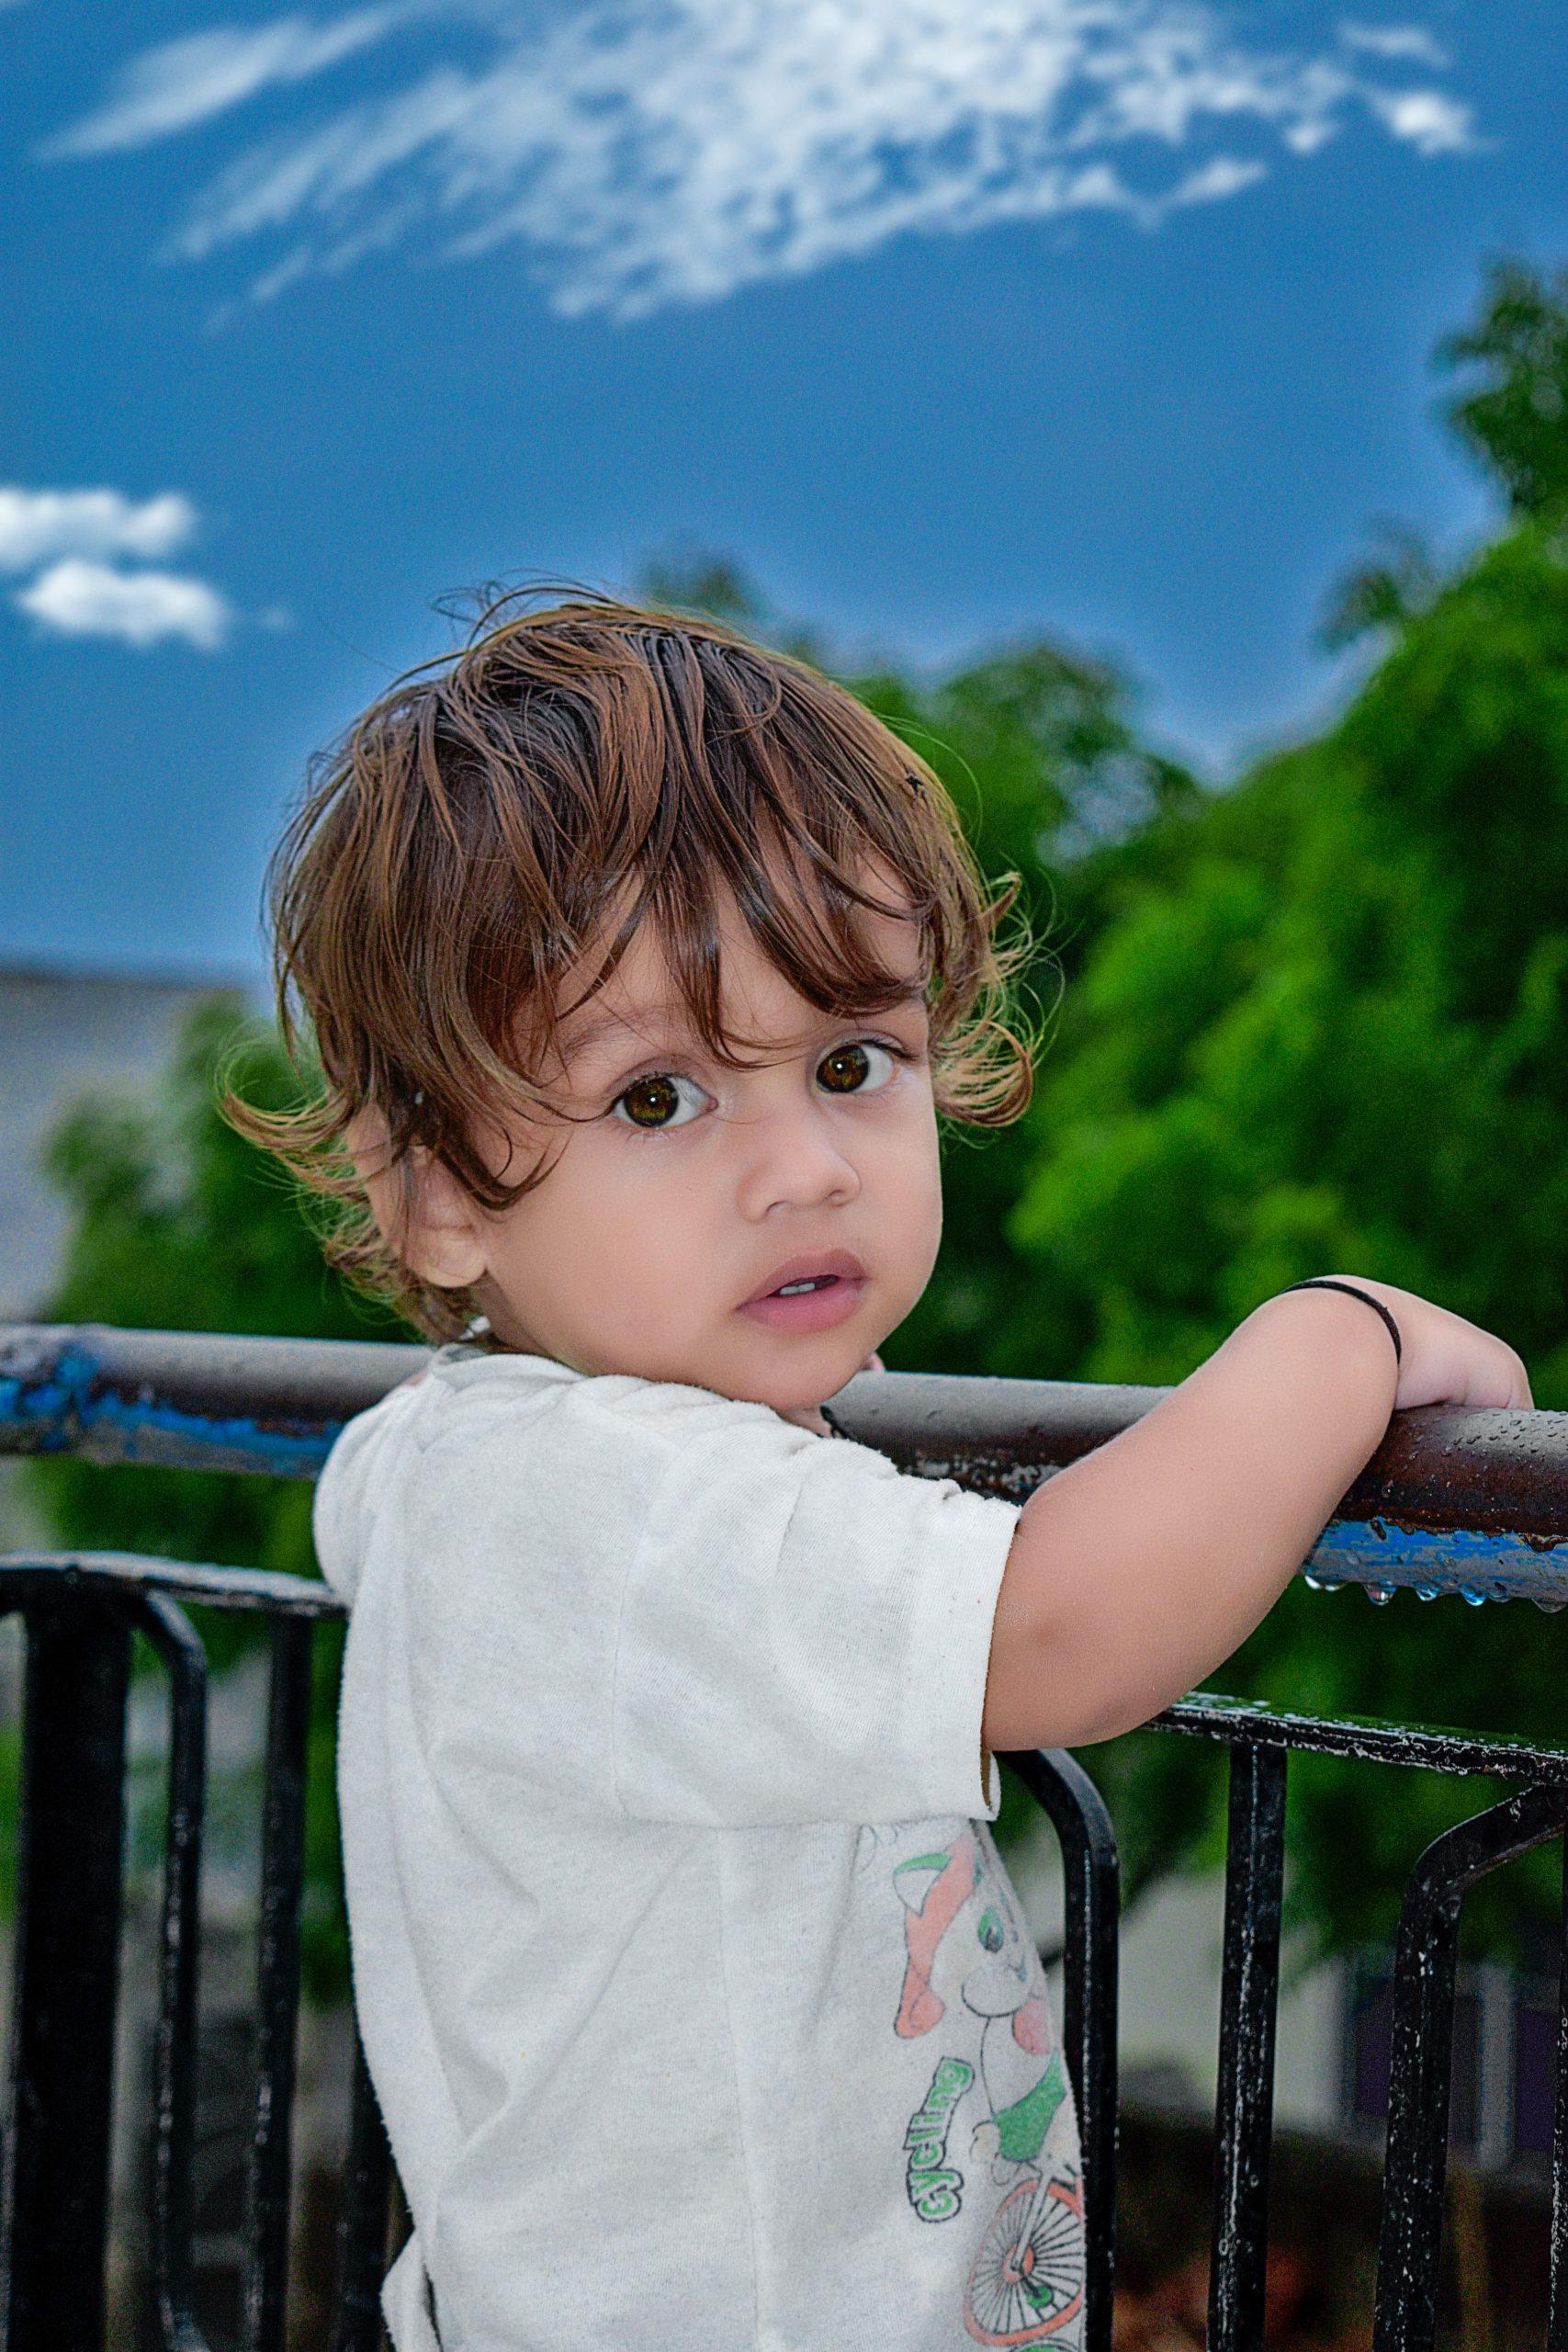 New Stylish Baby Boy Whatsapp Dp Images pics hd 2021